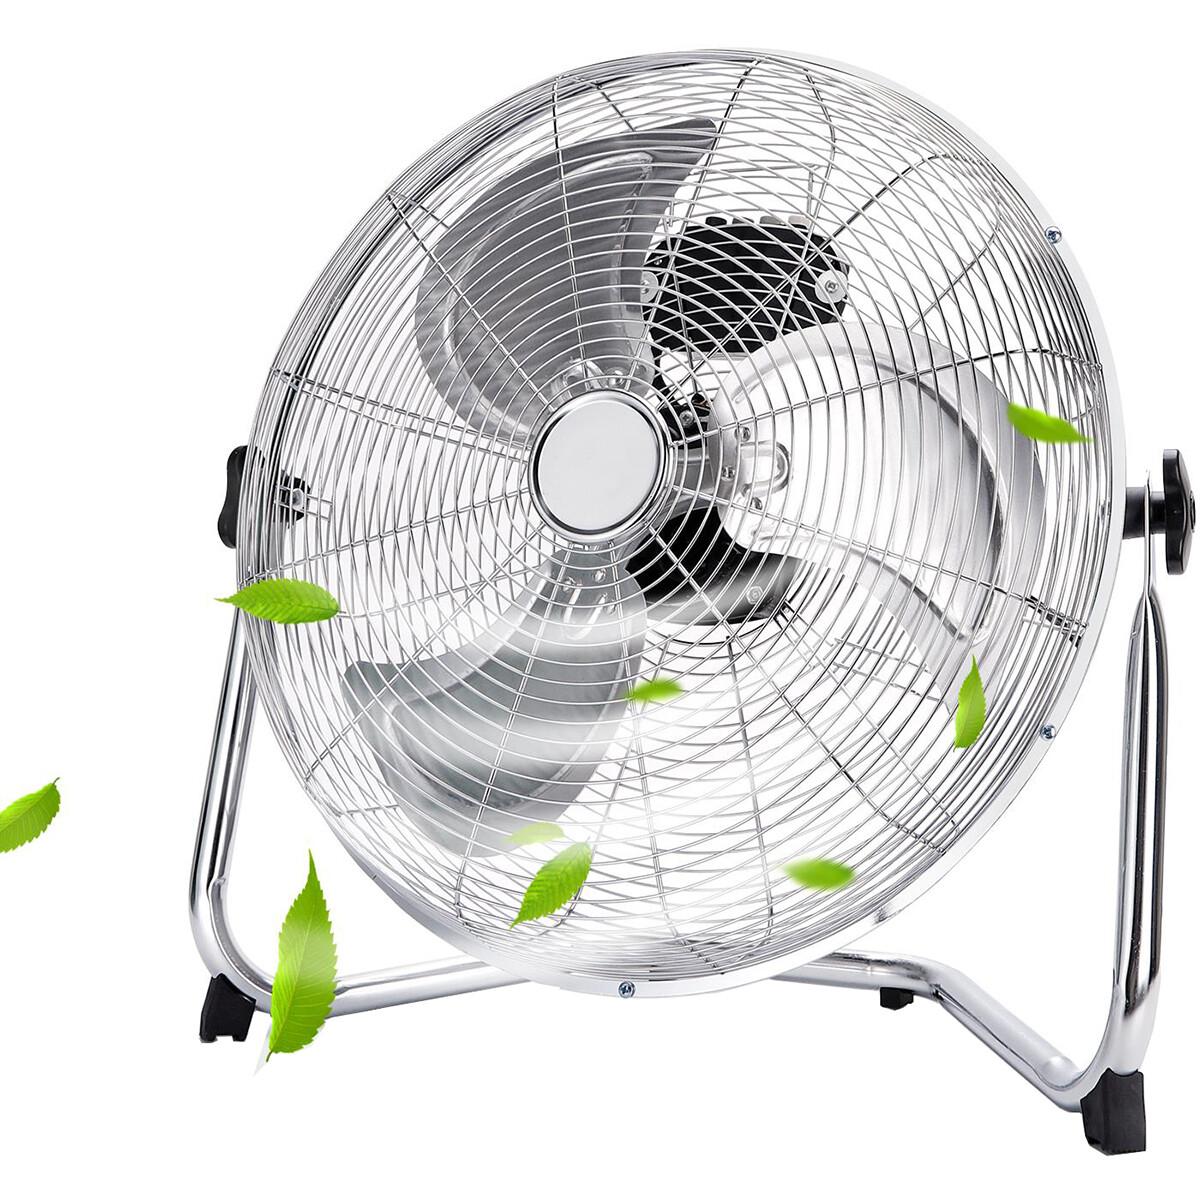 Ventilator - Aigi Tornimo - Vloerventilator - Staand - Rond - Mat Wit - Kunststof